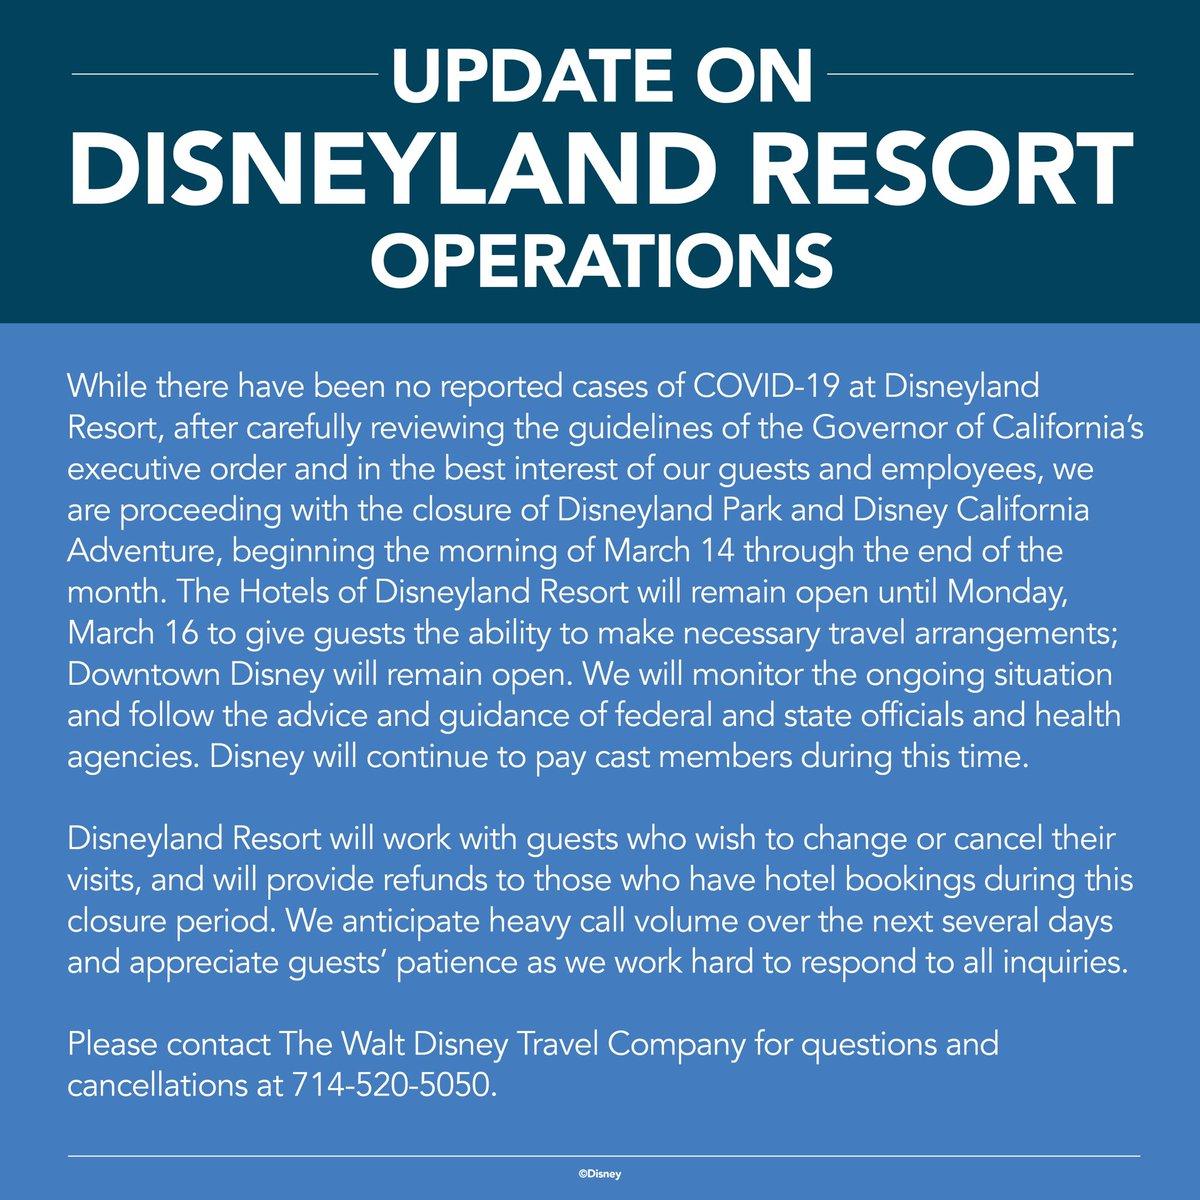 Disney Parks News (@DisneyParksNews) on Twitter photo 12/03/2020 21:12:22